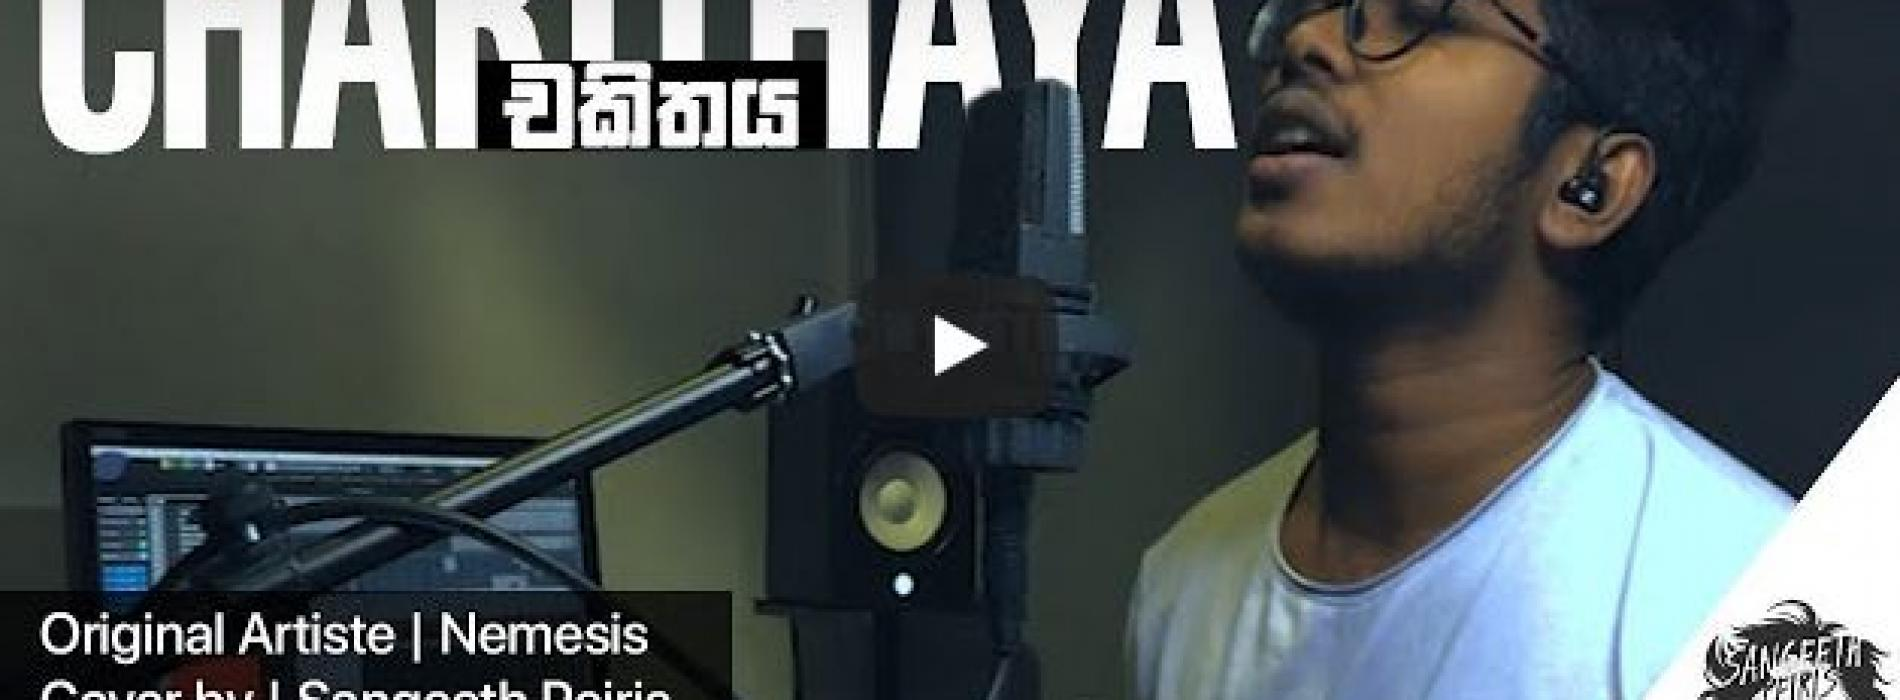 New Music : Chakithaya – Mihindu Ariyaratne | Nemesis | Cover By Sangeeth Peiris